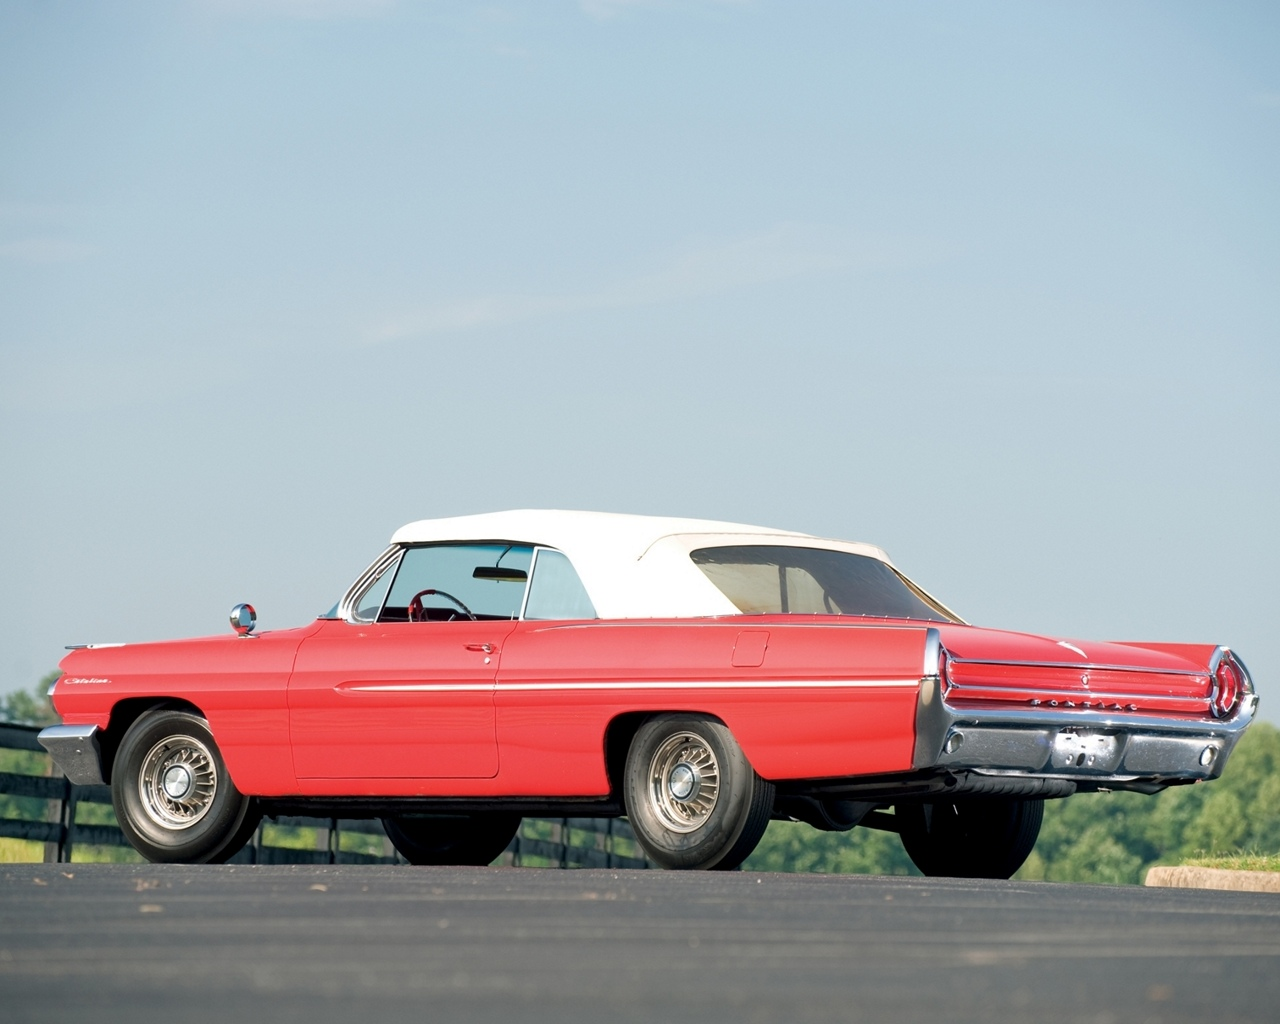 http://4.bp.blogspot.com/-V_0kYyQXXvk/T-IN3K8G6FI/AAAAAAAAAUI/NplMEIiOWa0/s1600/American+Classic+Cars+Wallpapers+1280+X+1024+(3).jpg